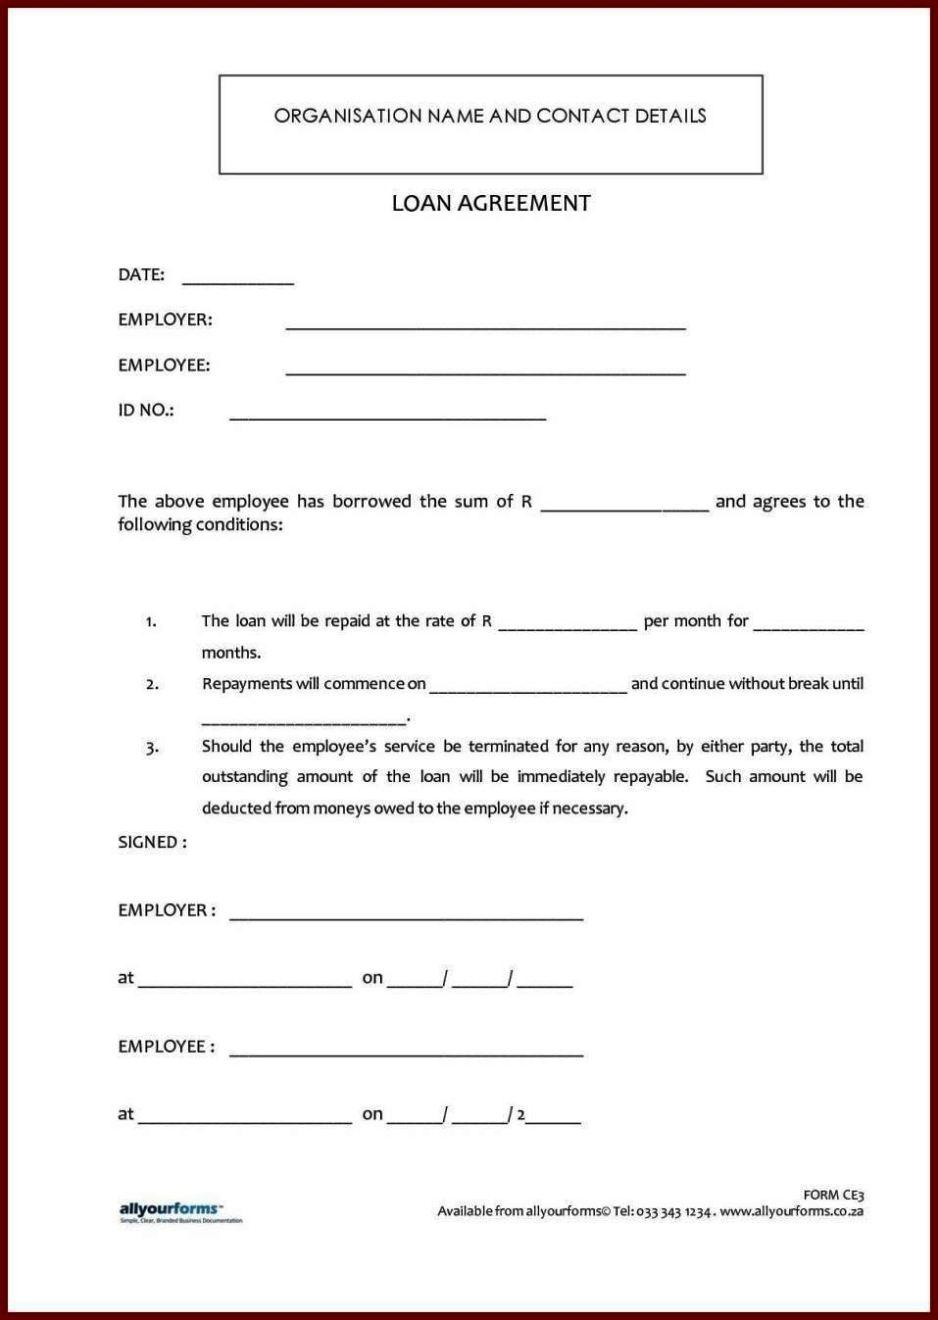 Standard-Loan-Agreement-Template-Free Sample Application Form Docx on for matron job, high school, u.s. visa, bridge 2rwanda, auto loan, german schengen visa, uk visa, personal loan, us passport renewal,